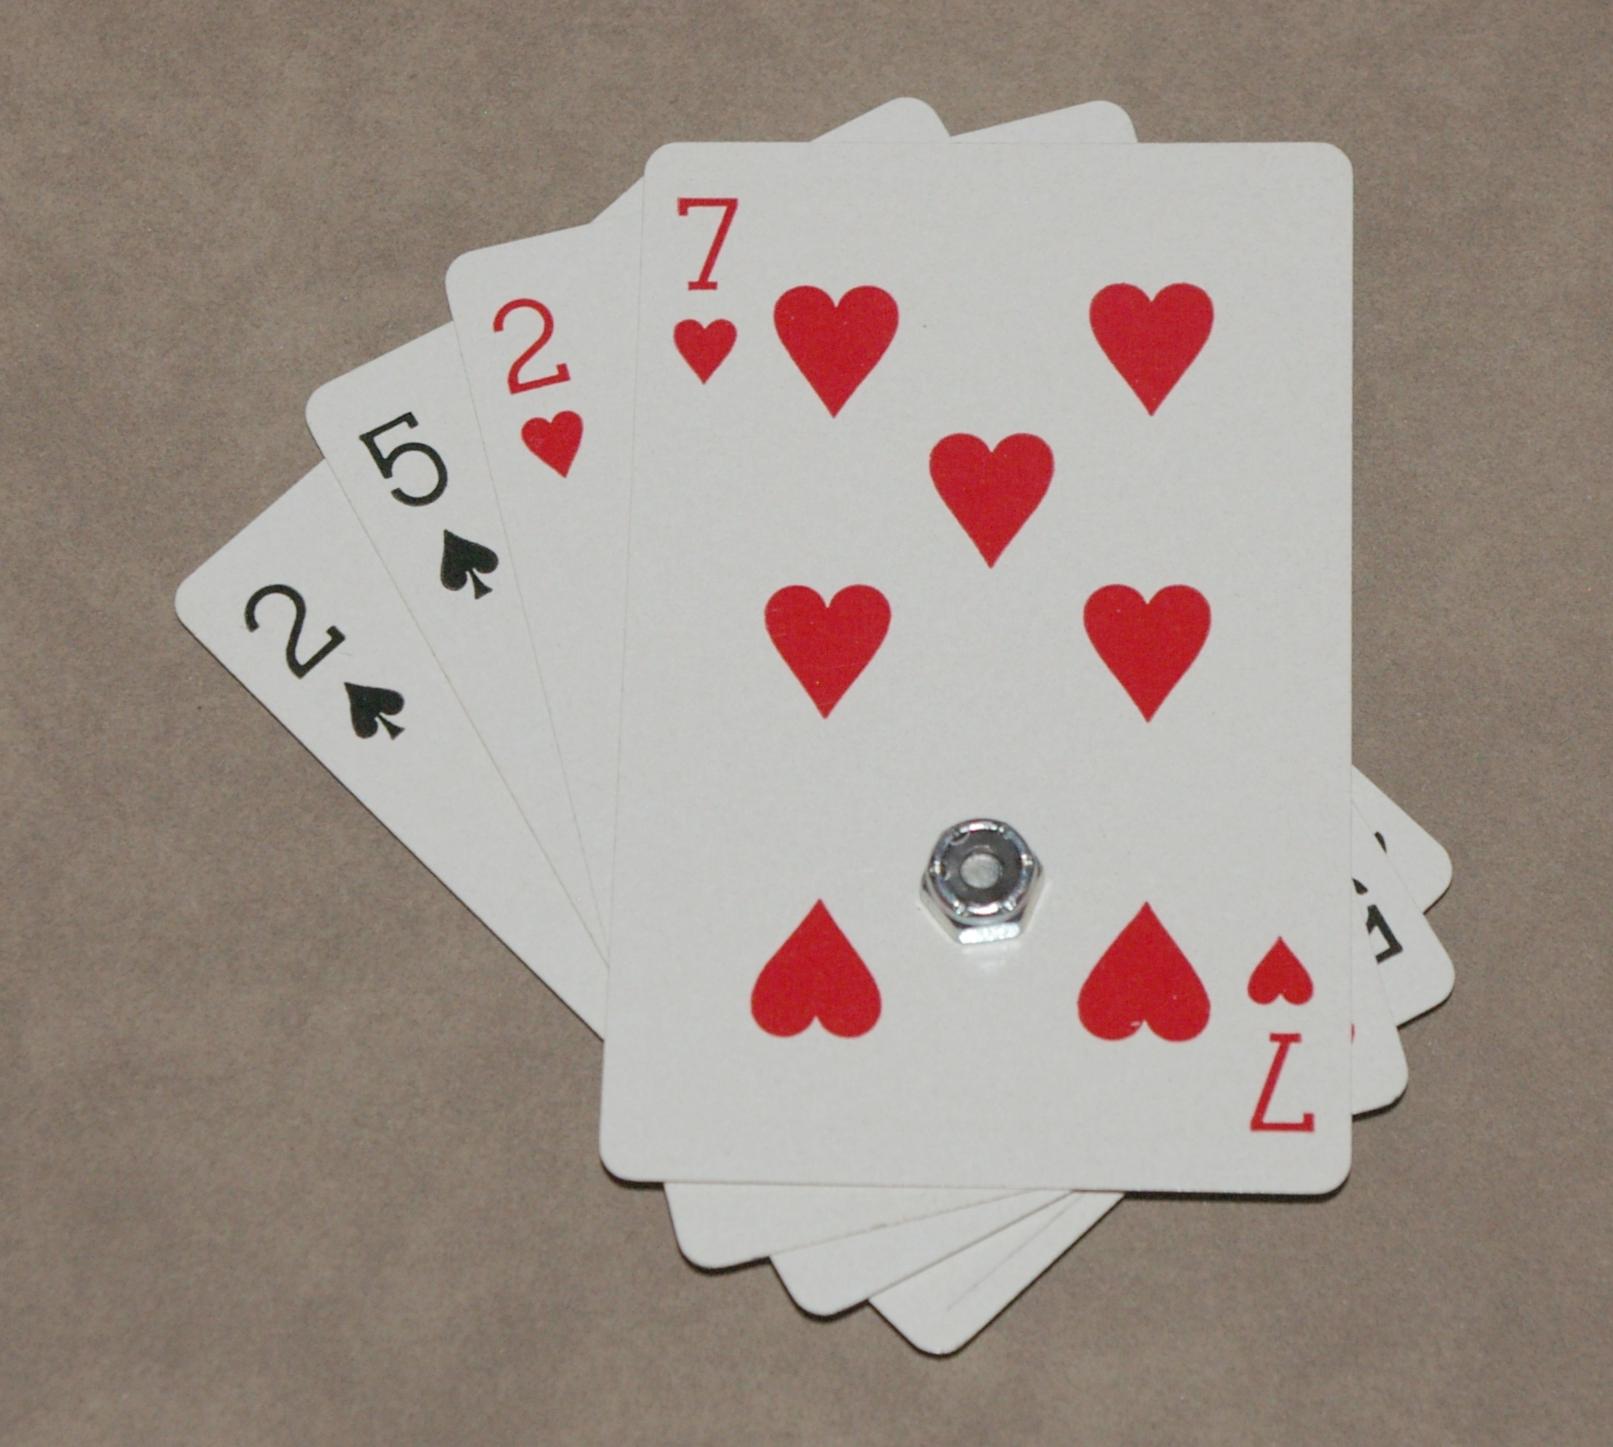 Homework 8: Blackjack